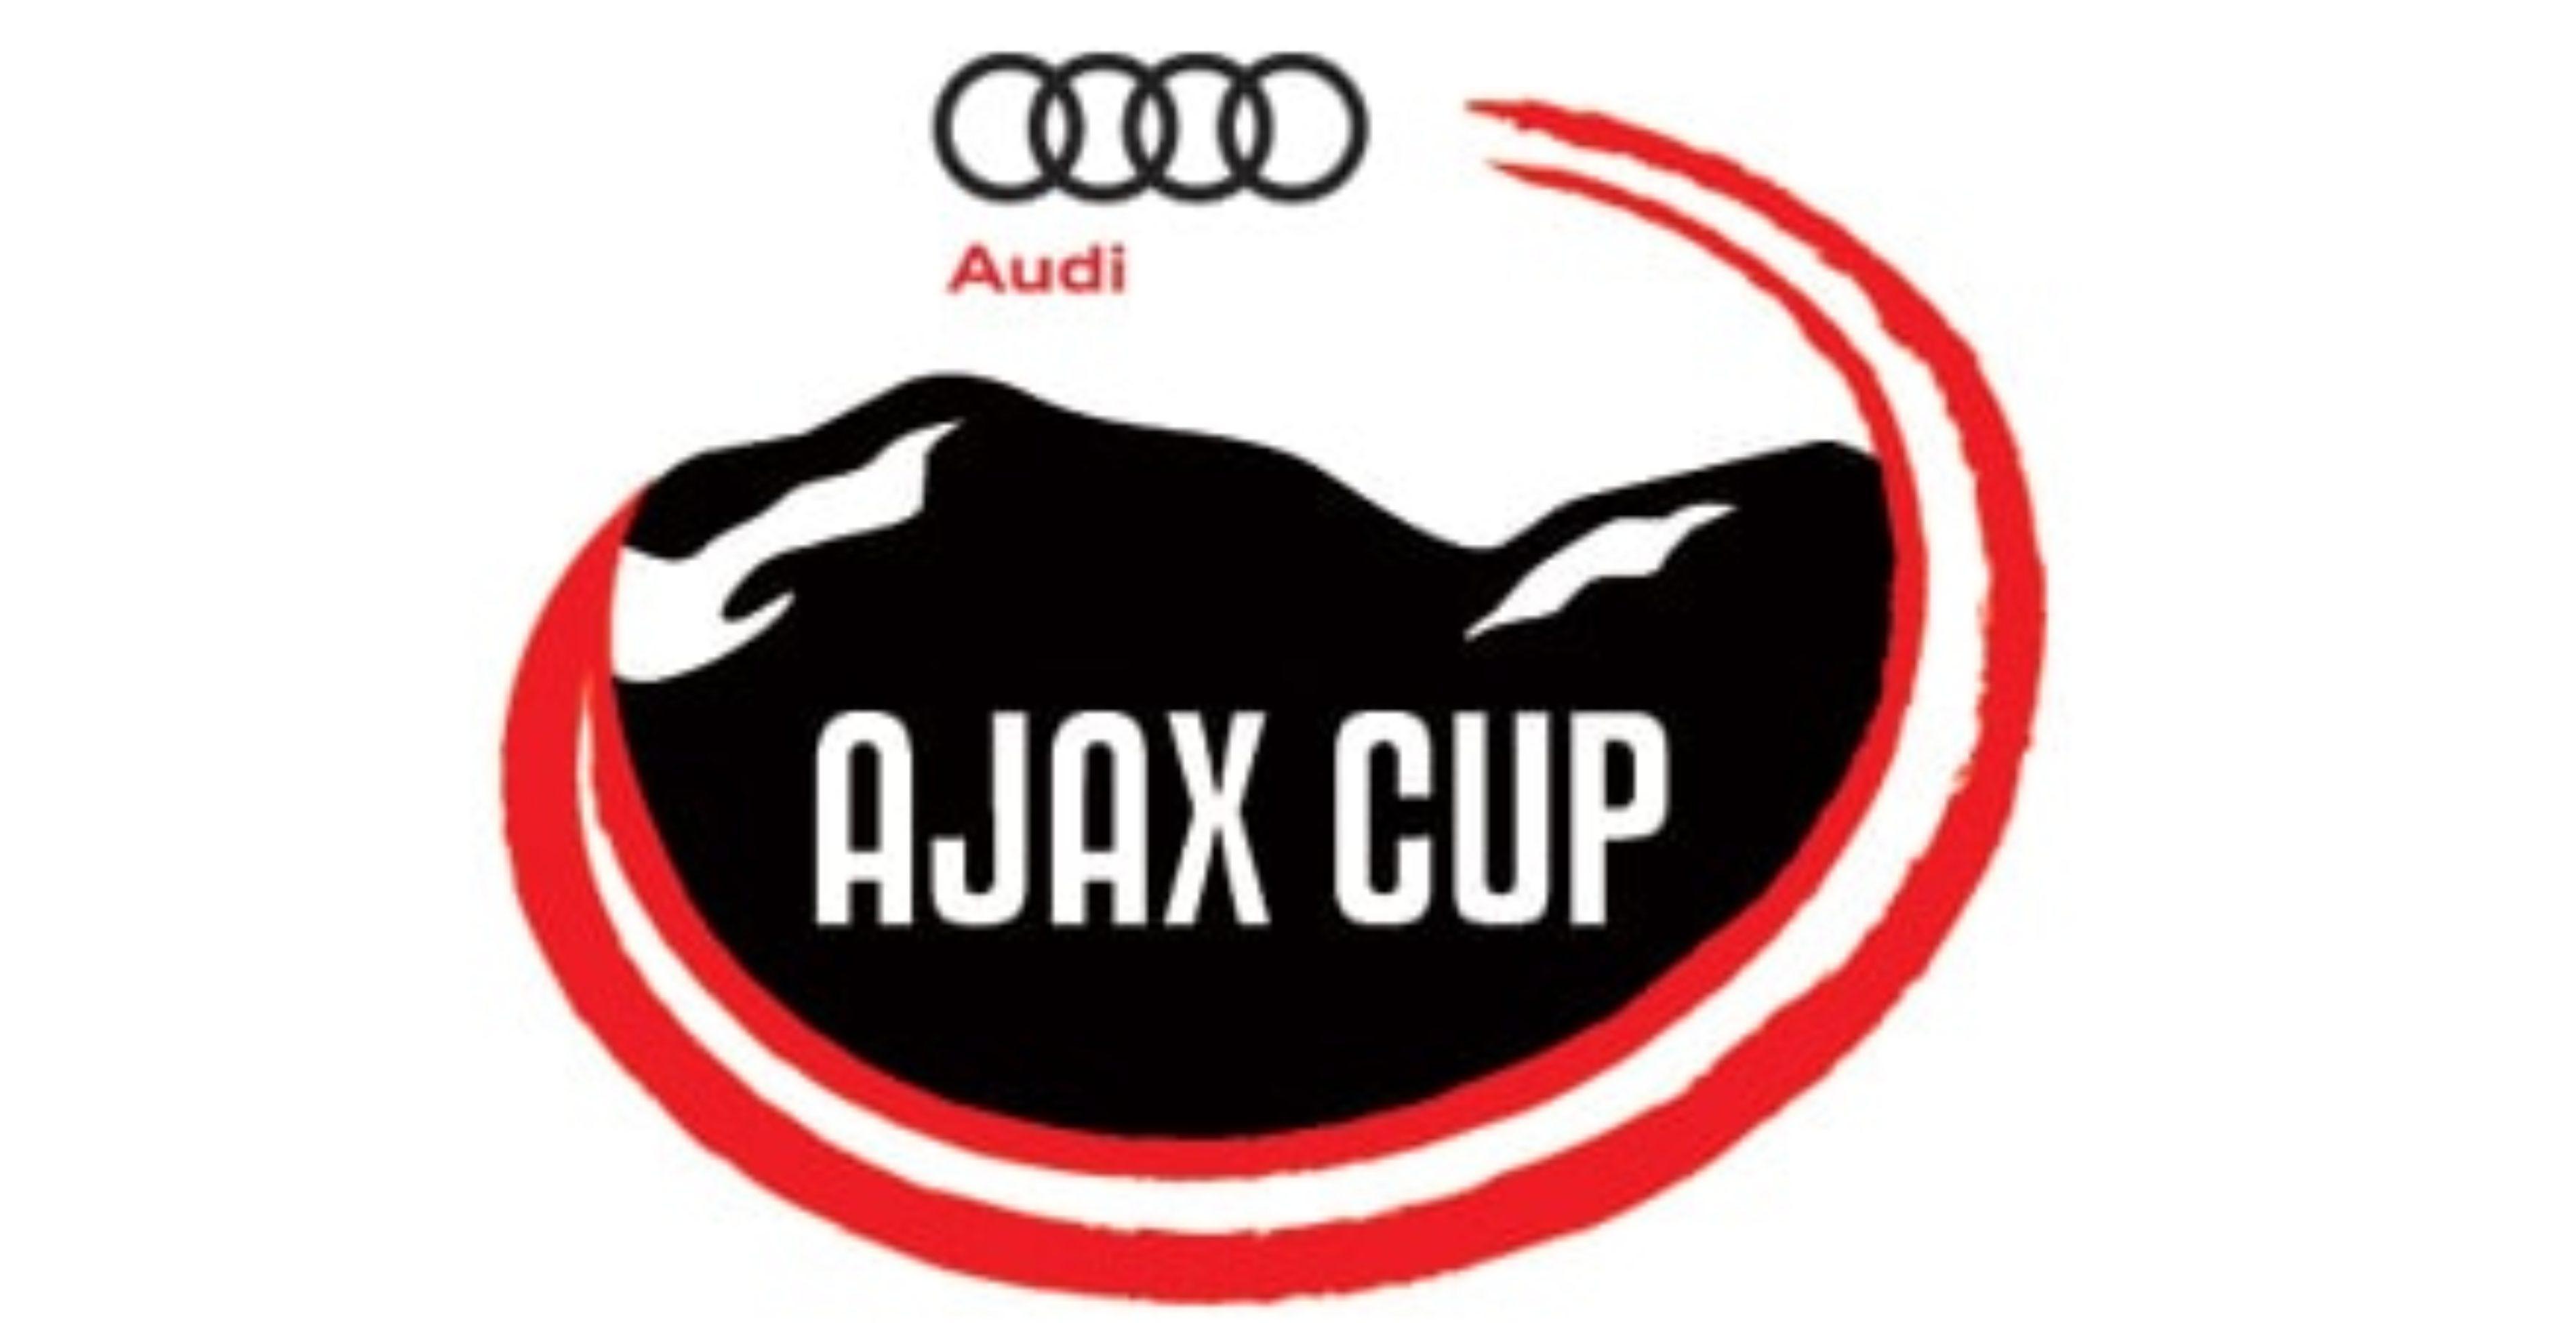 Ajax cup logo